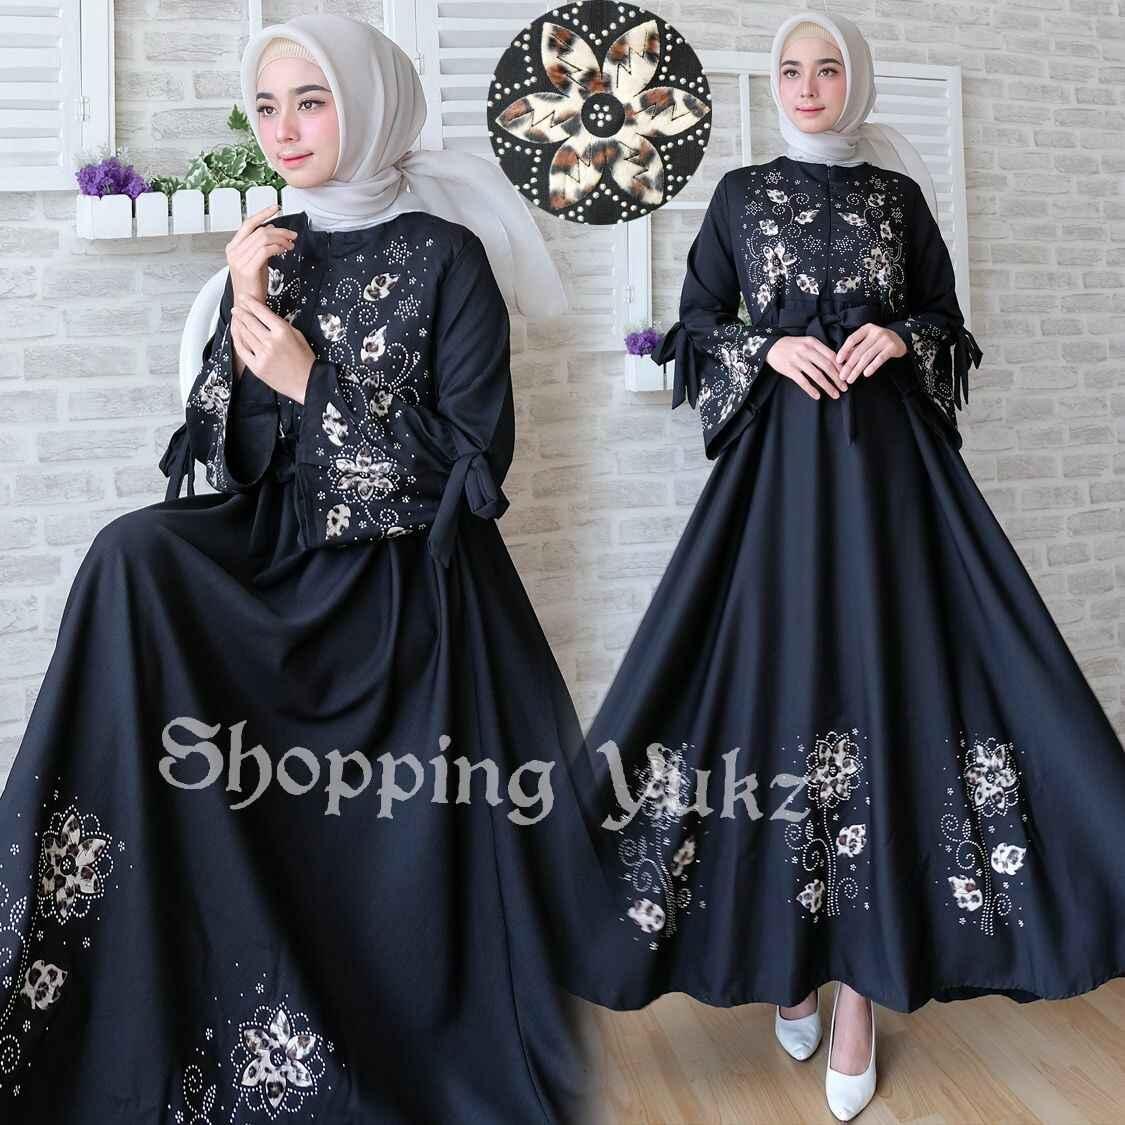 Shopping Yukz Baju Gamis Dress Muslim Syari Wanita MAXI FLOWER HITAM ( Tanpa Jilbab ) / Hijab Muslimah / Baju Muslimah Wanita / Syari Syari'i Muslim / Gaun Muslim / Long Dress Muslimah Wanita